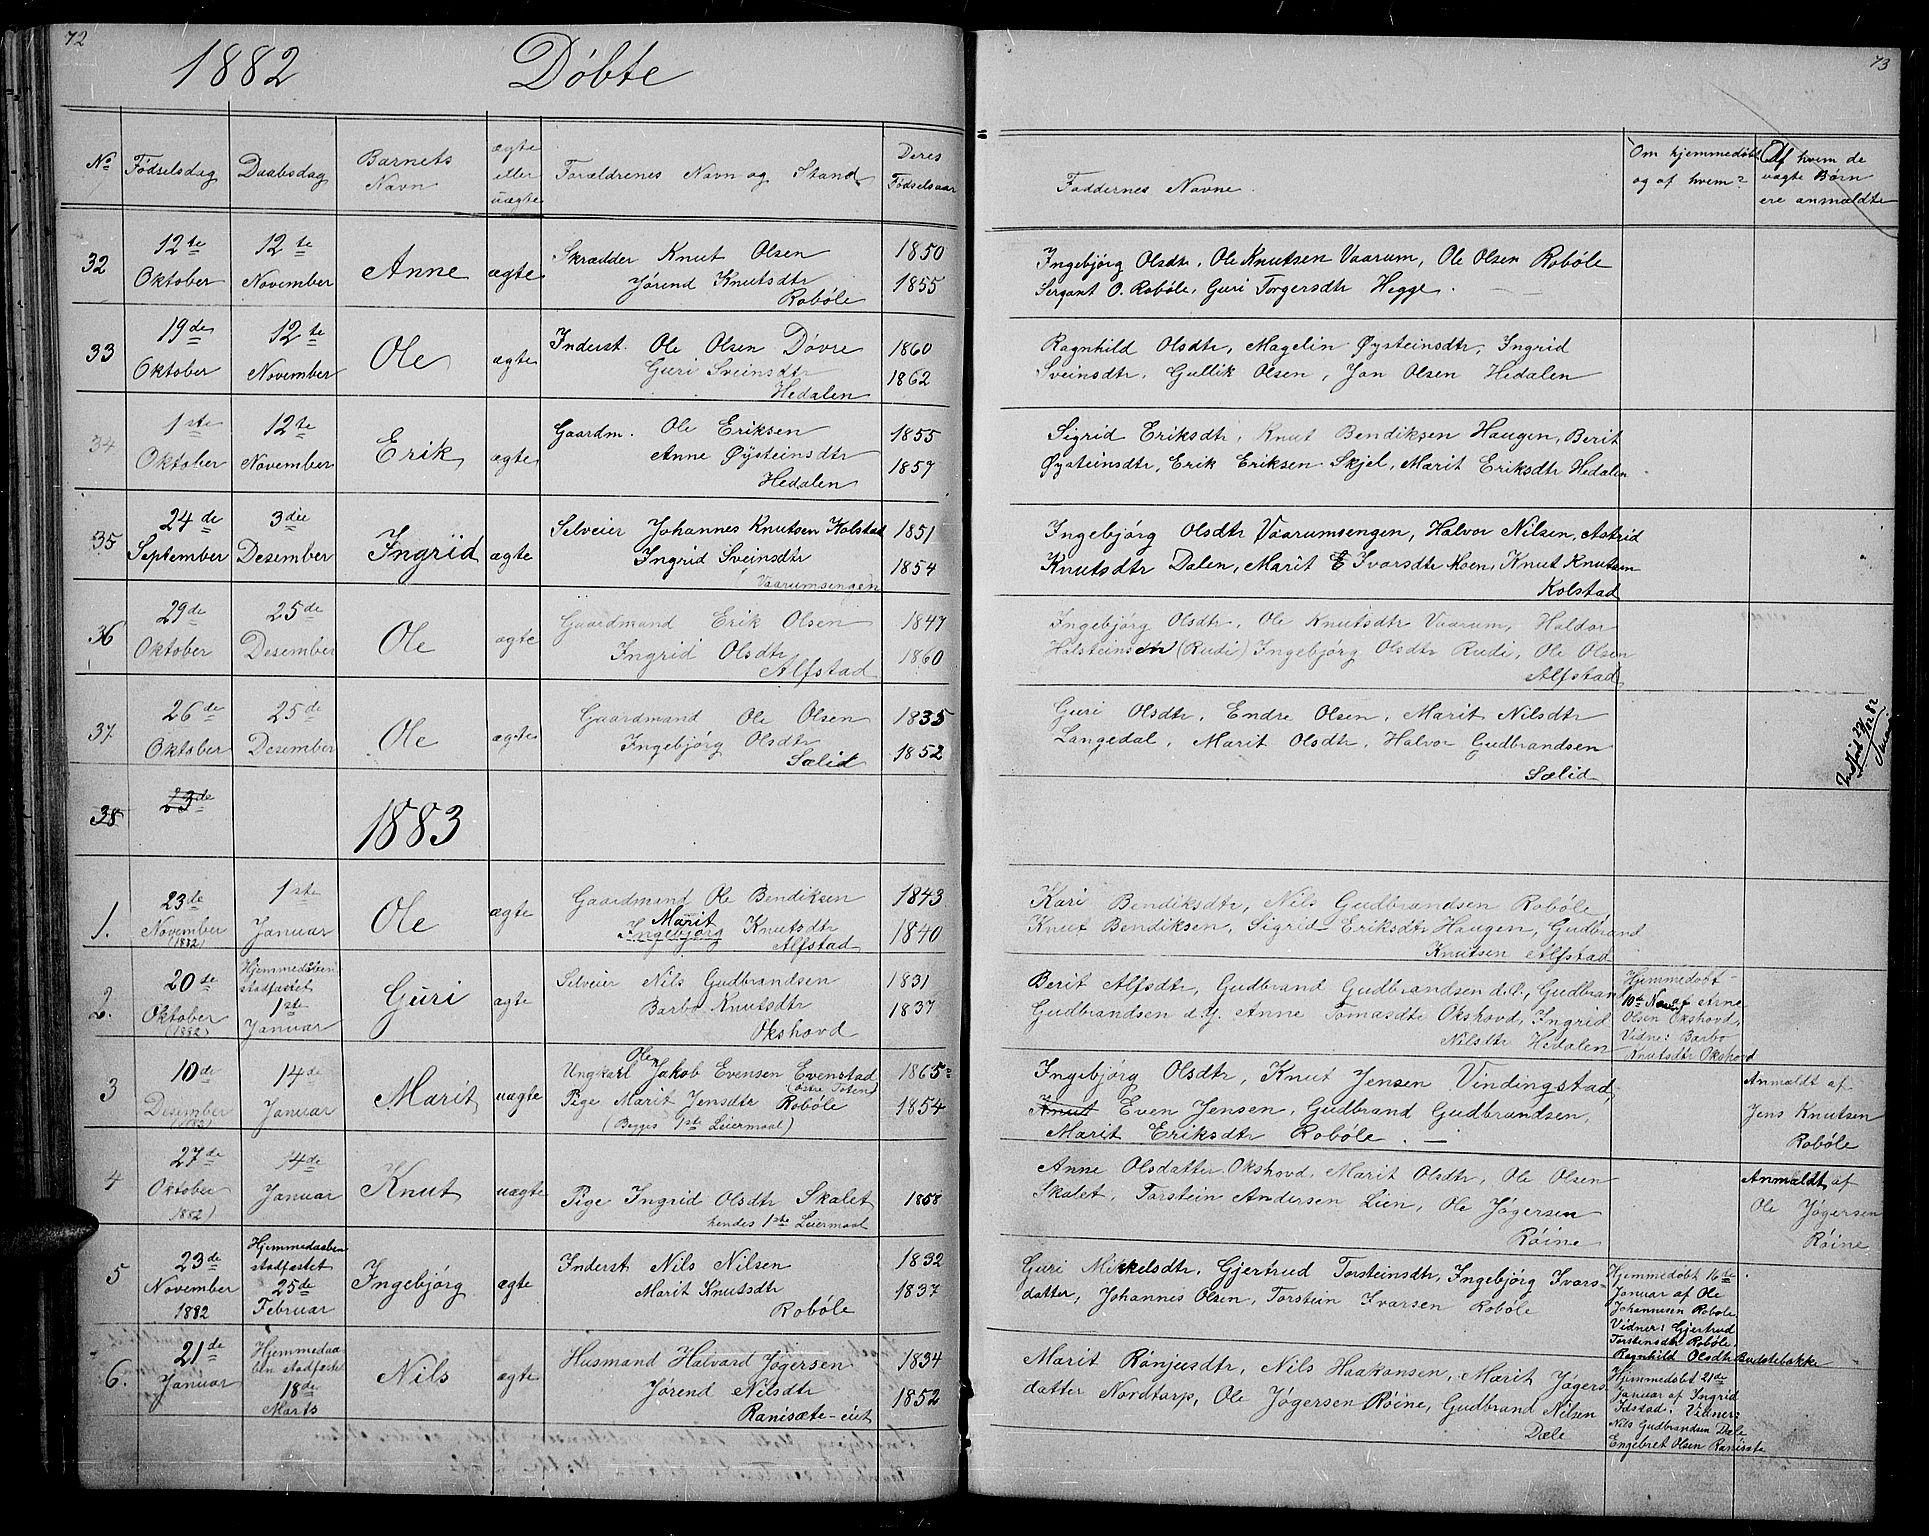 SAH, Øystre Slidre prestekontor, Klokkerbok nr. 1, 1866-1886, s. 72-73